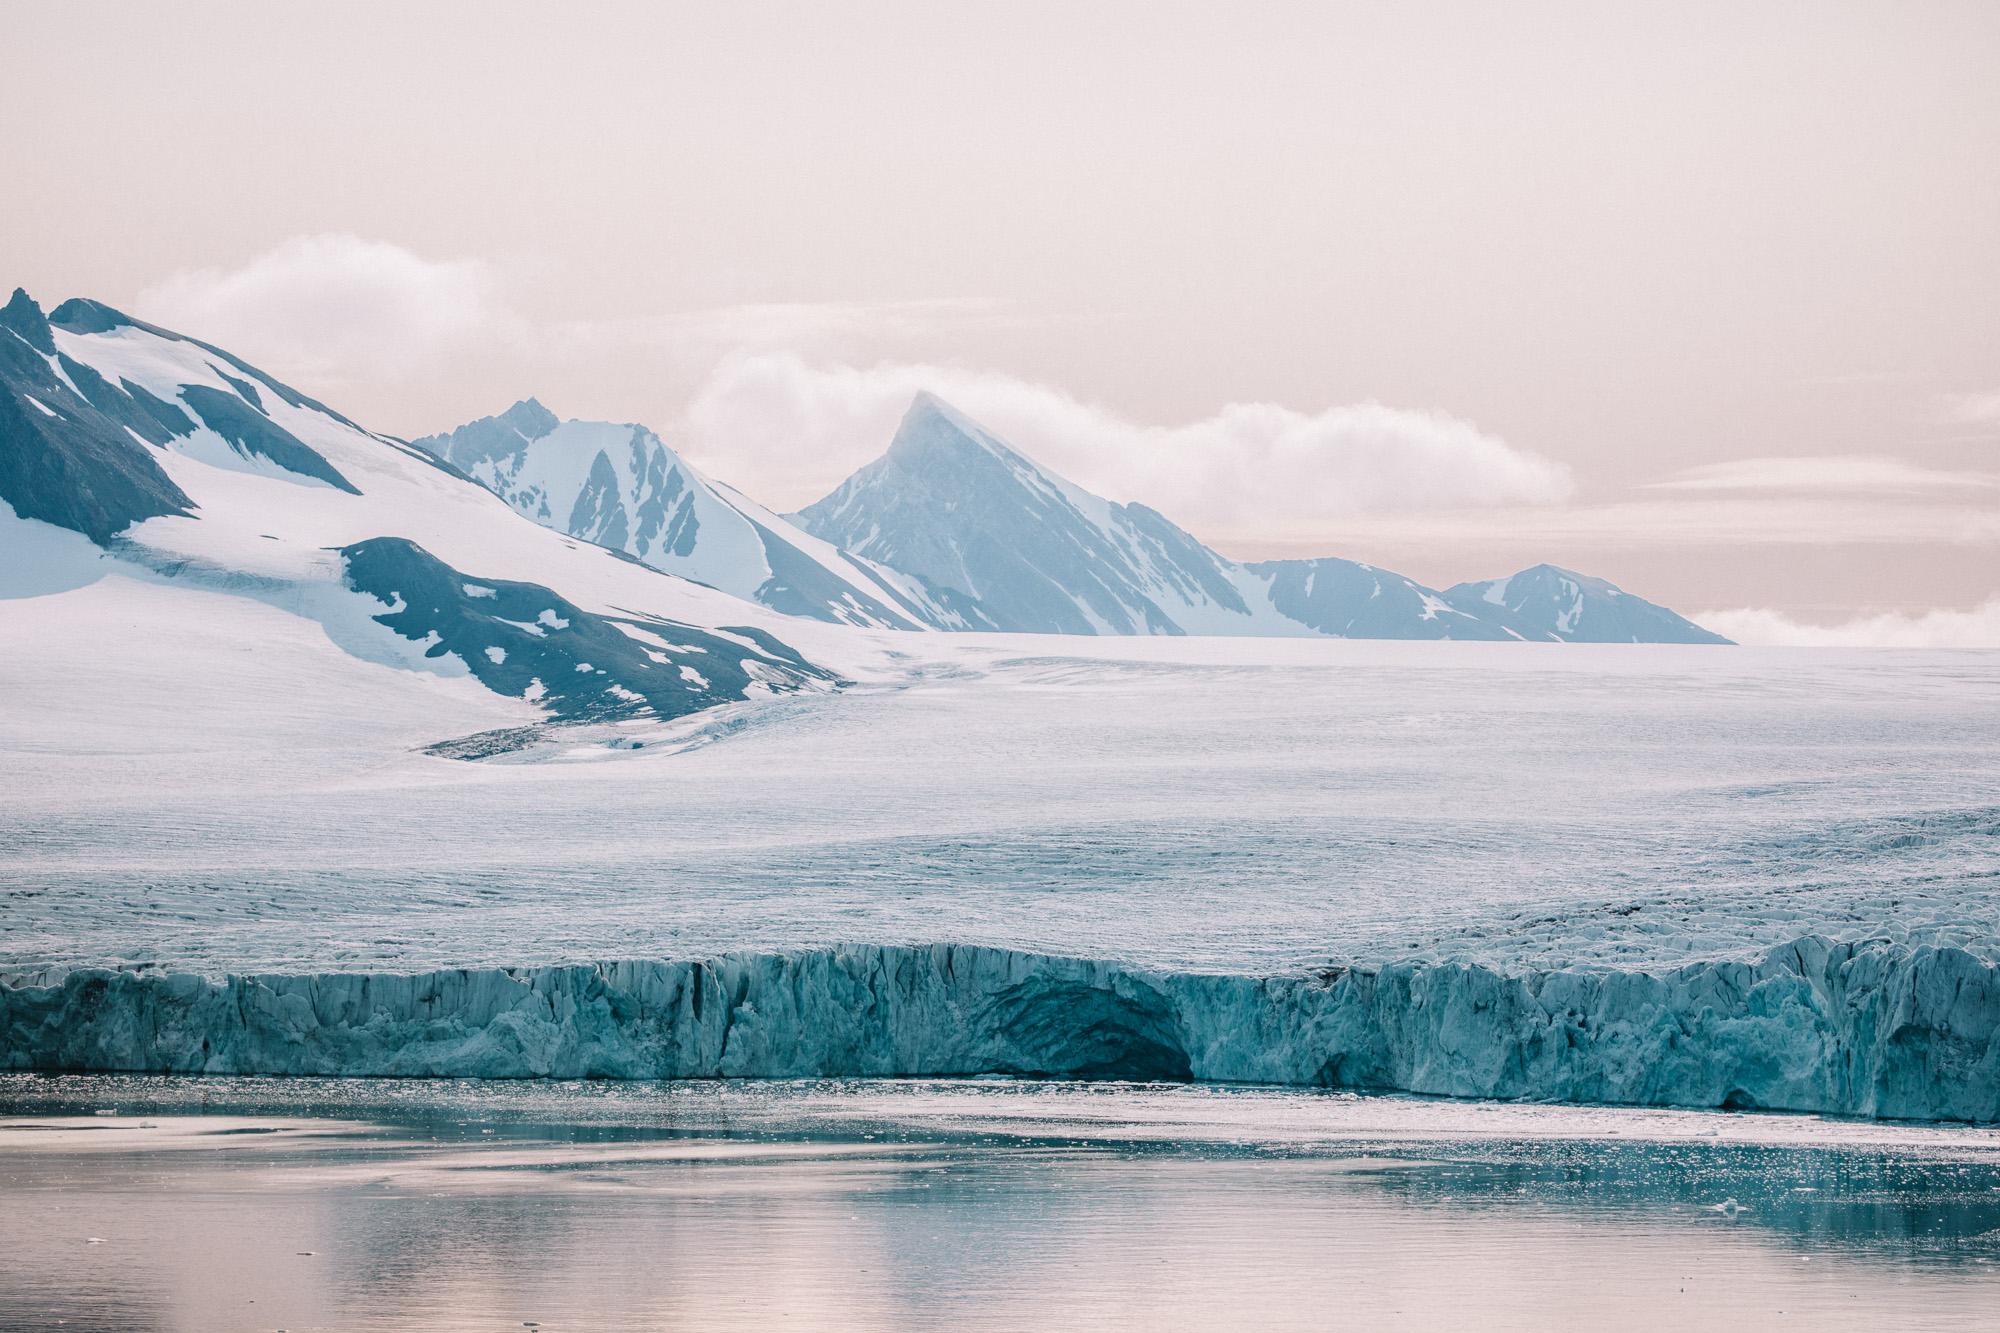 Samarinbreen glacier in Sørkapp Land at Spitsbergen, Svalbard